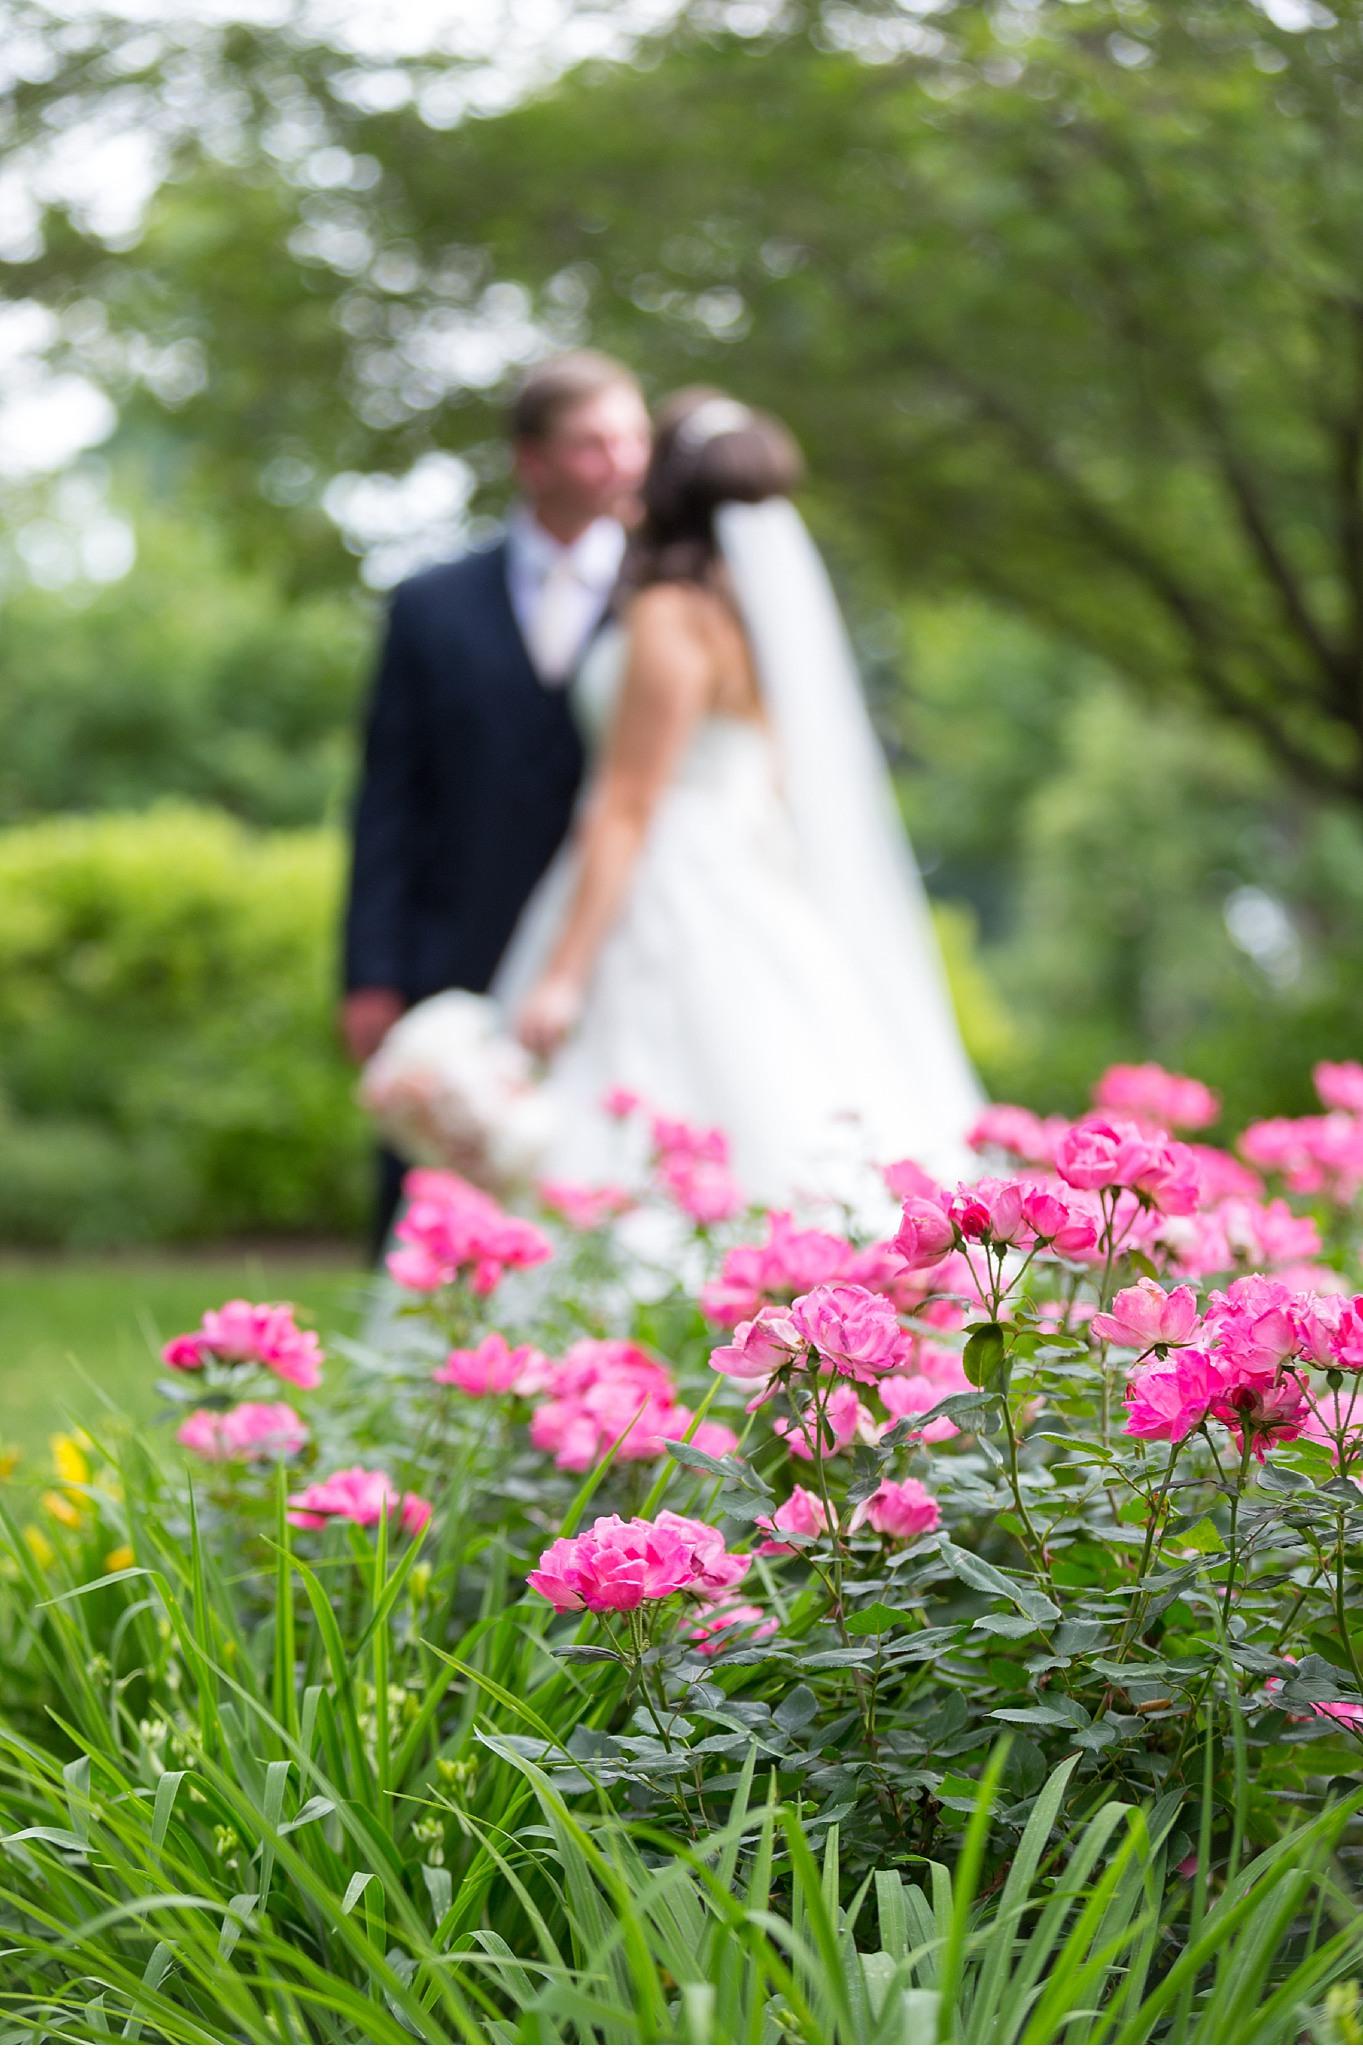 Hershey Gardens Hershey Country Club Summer beautiful wedding photography_1604.jpg